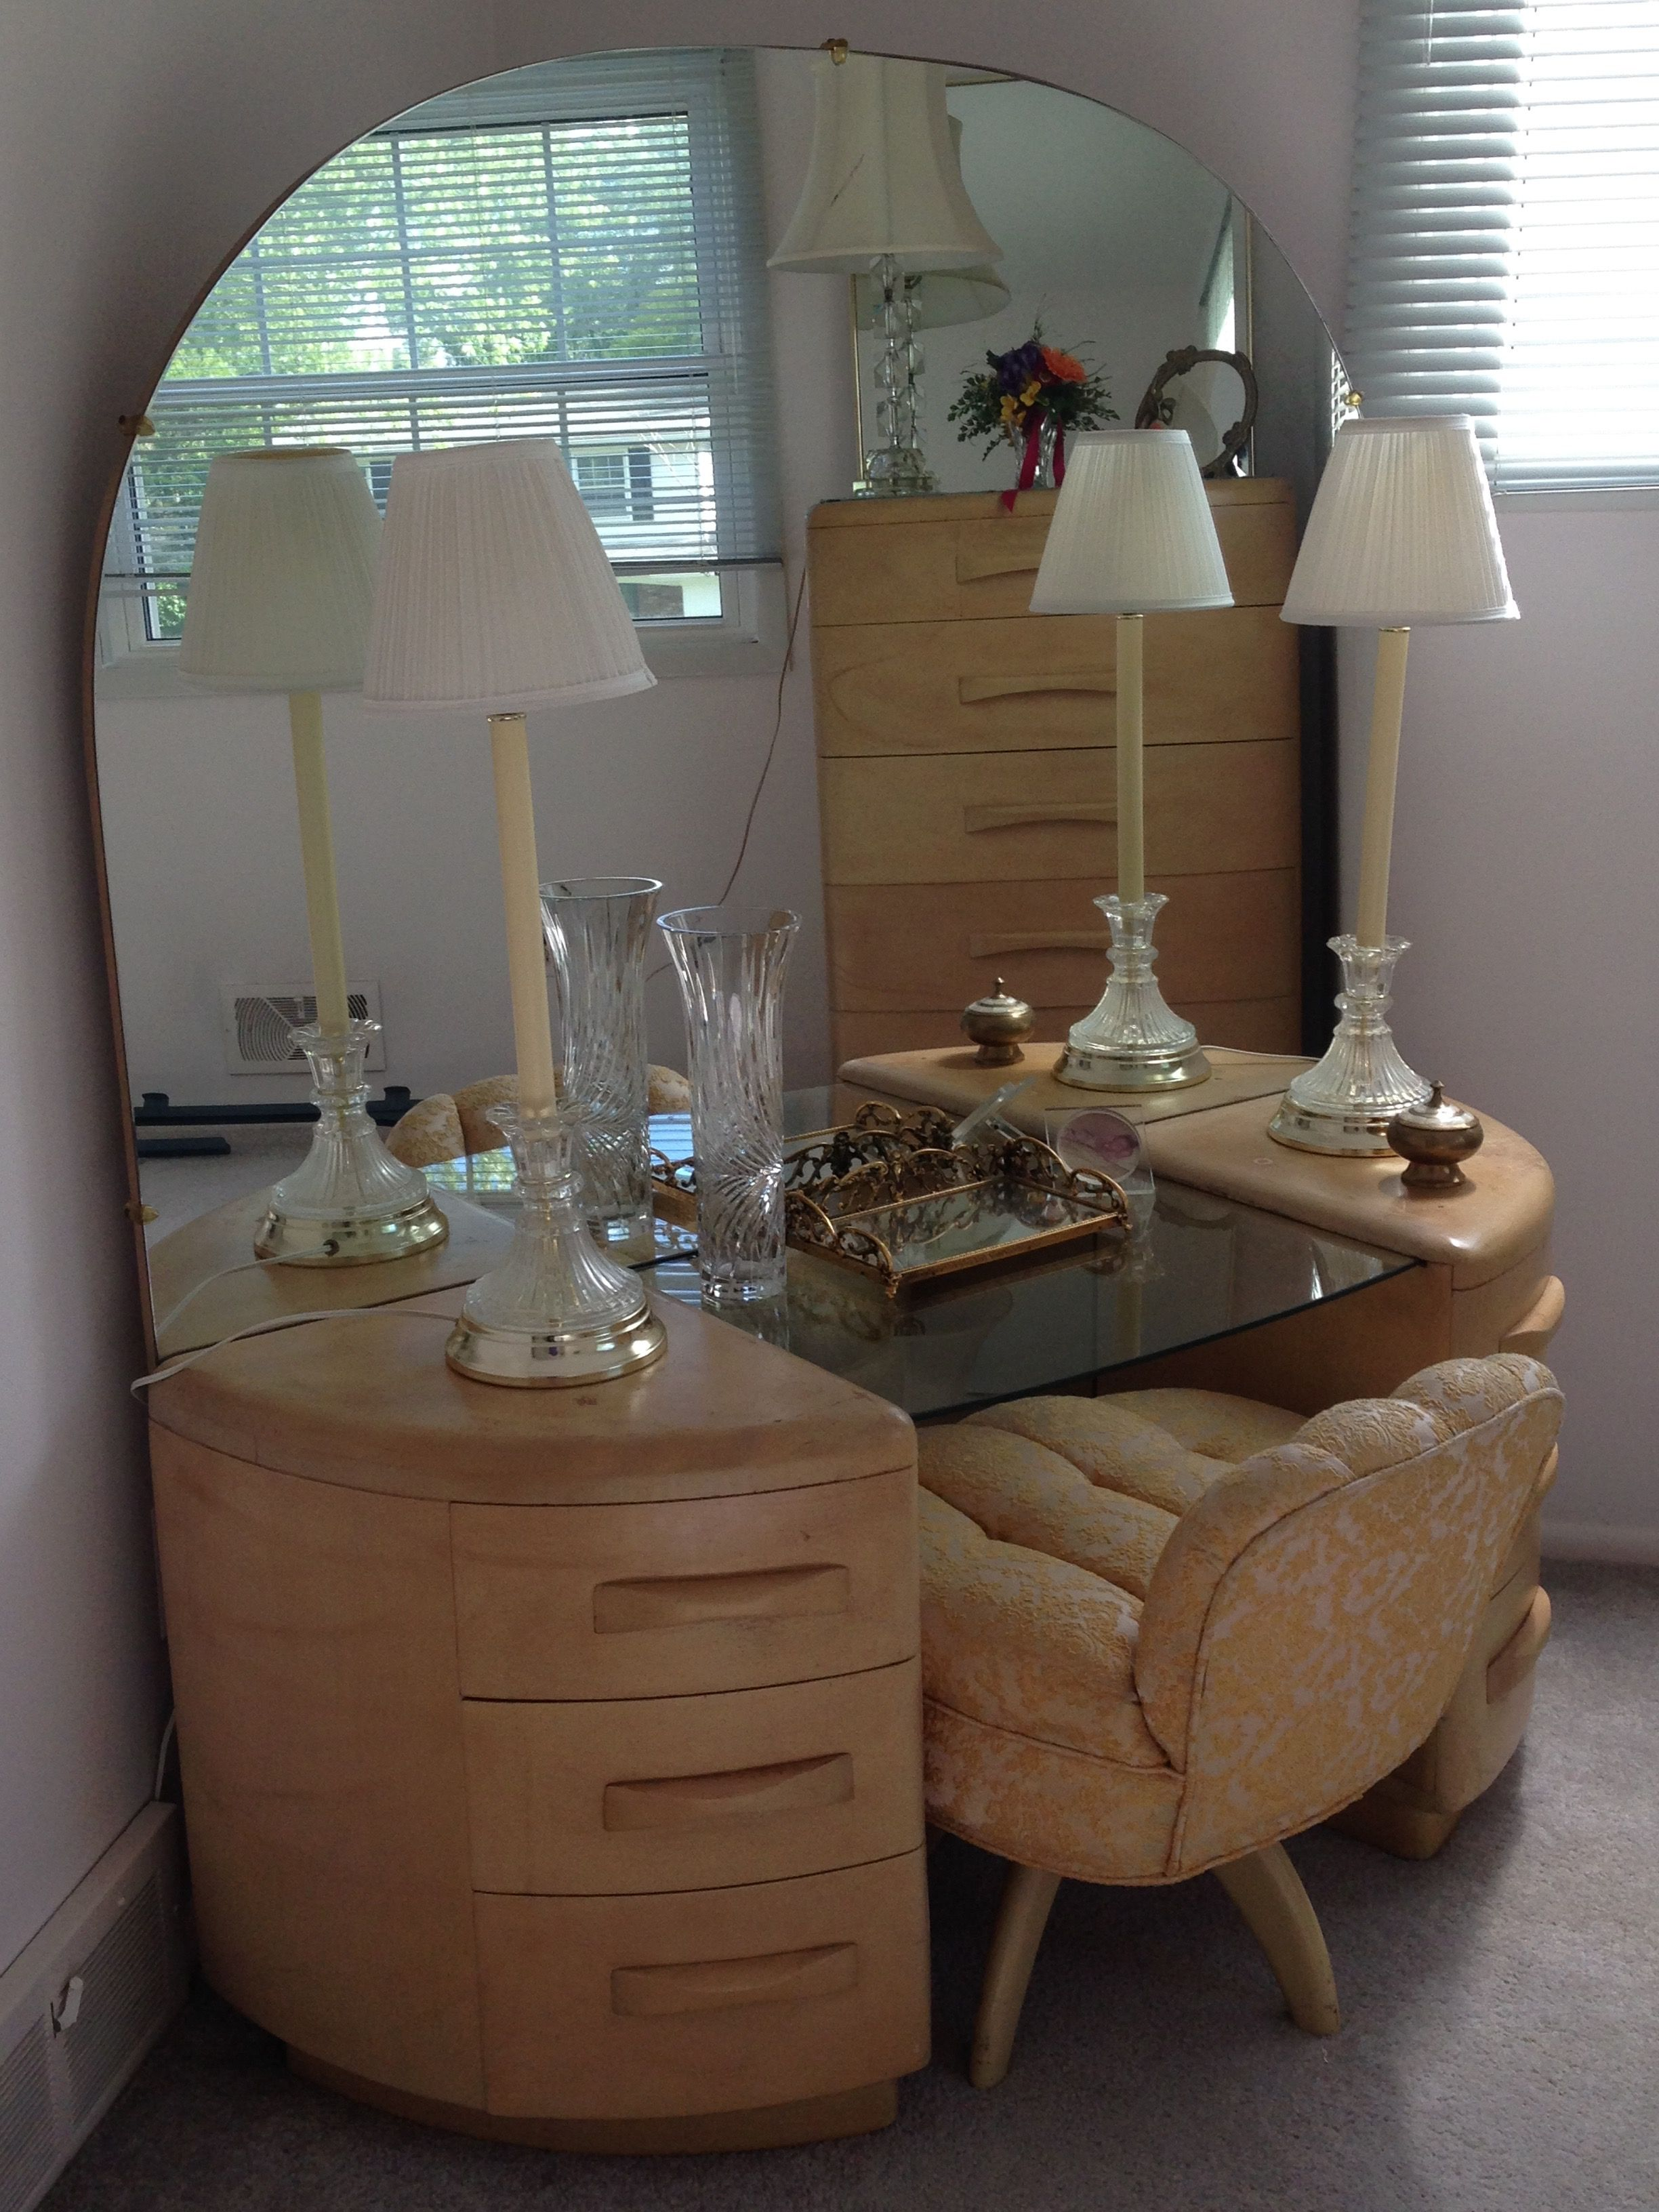 Heywood Wakefield Bedroom Set Detroit Michigan Craigslist Luxurious Bedrooms Retro Home Decor Dressing Table Vanity